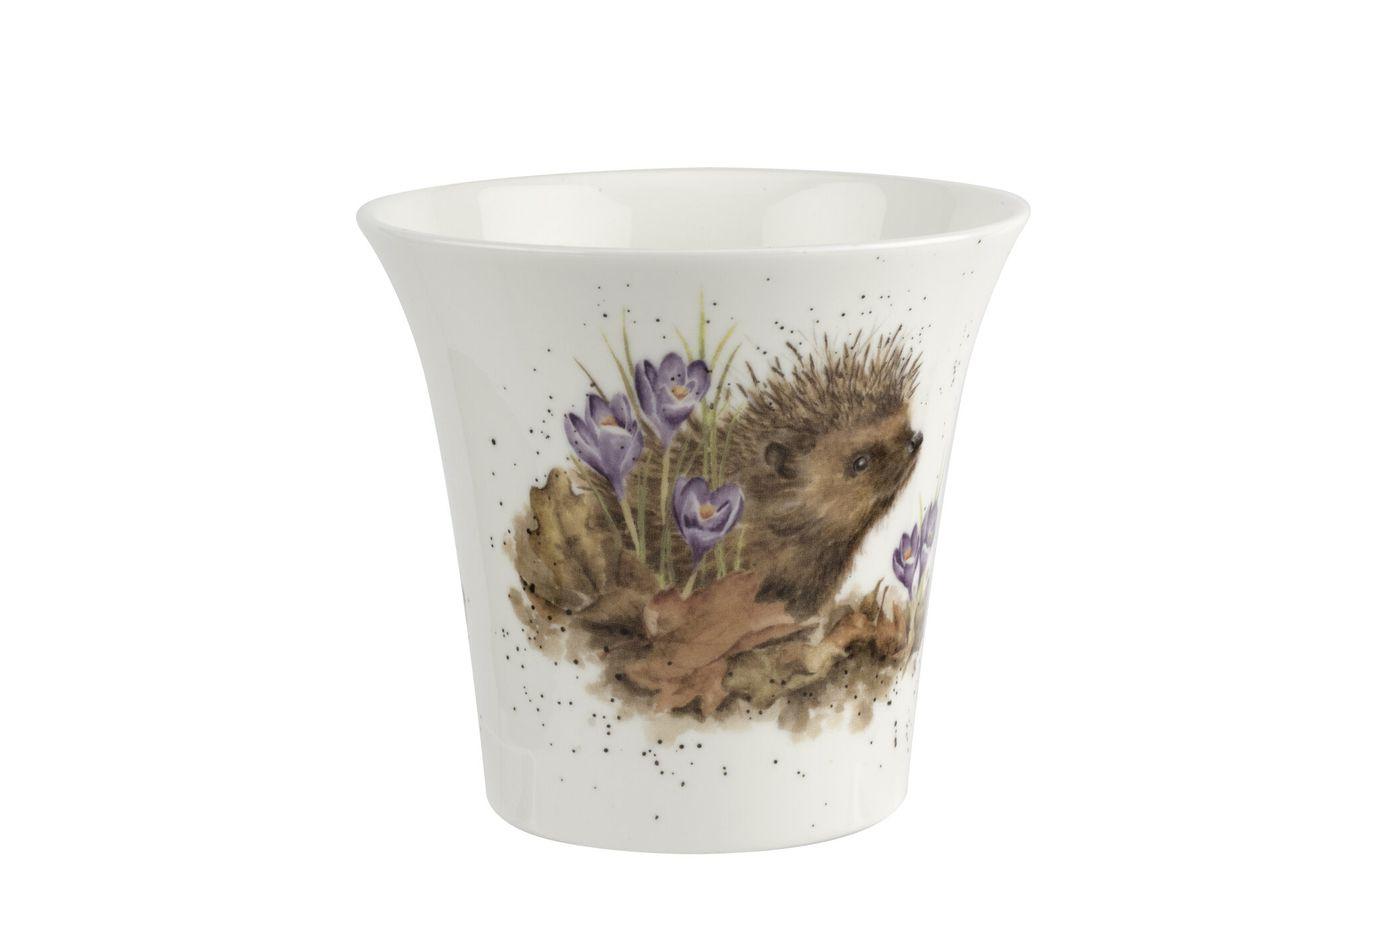 Royal Worcester Wrendale Designs Flower Pot 10cm thumb 2